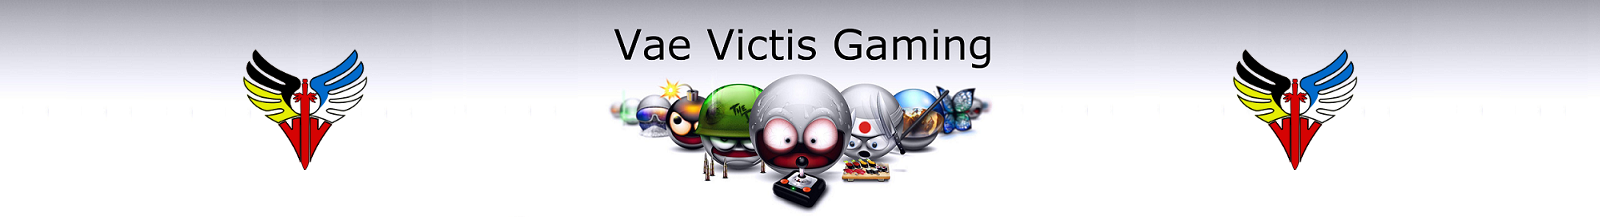 Vae Victis Gaming